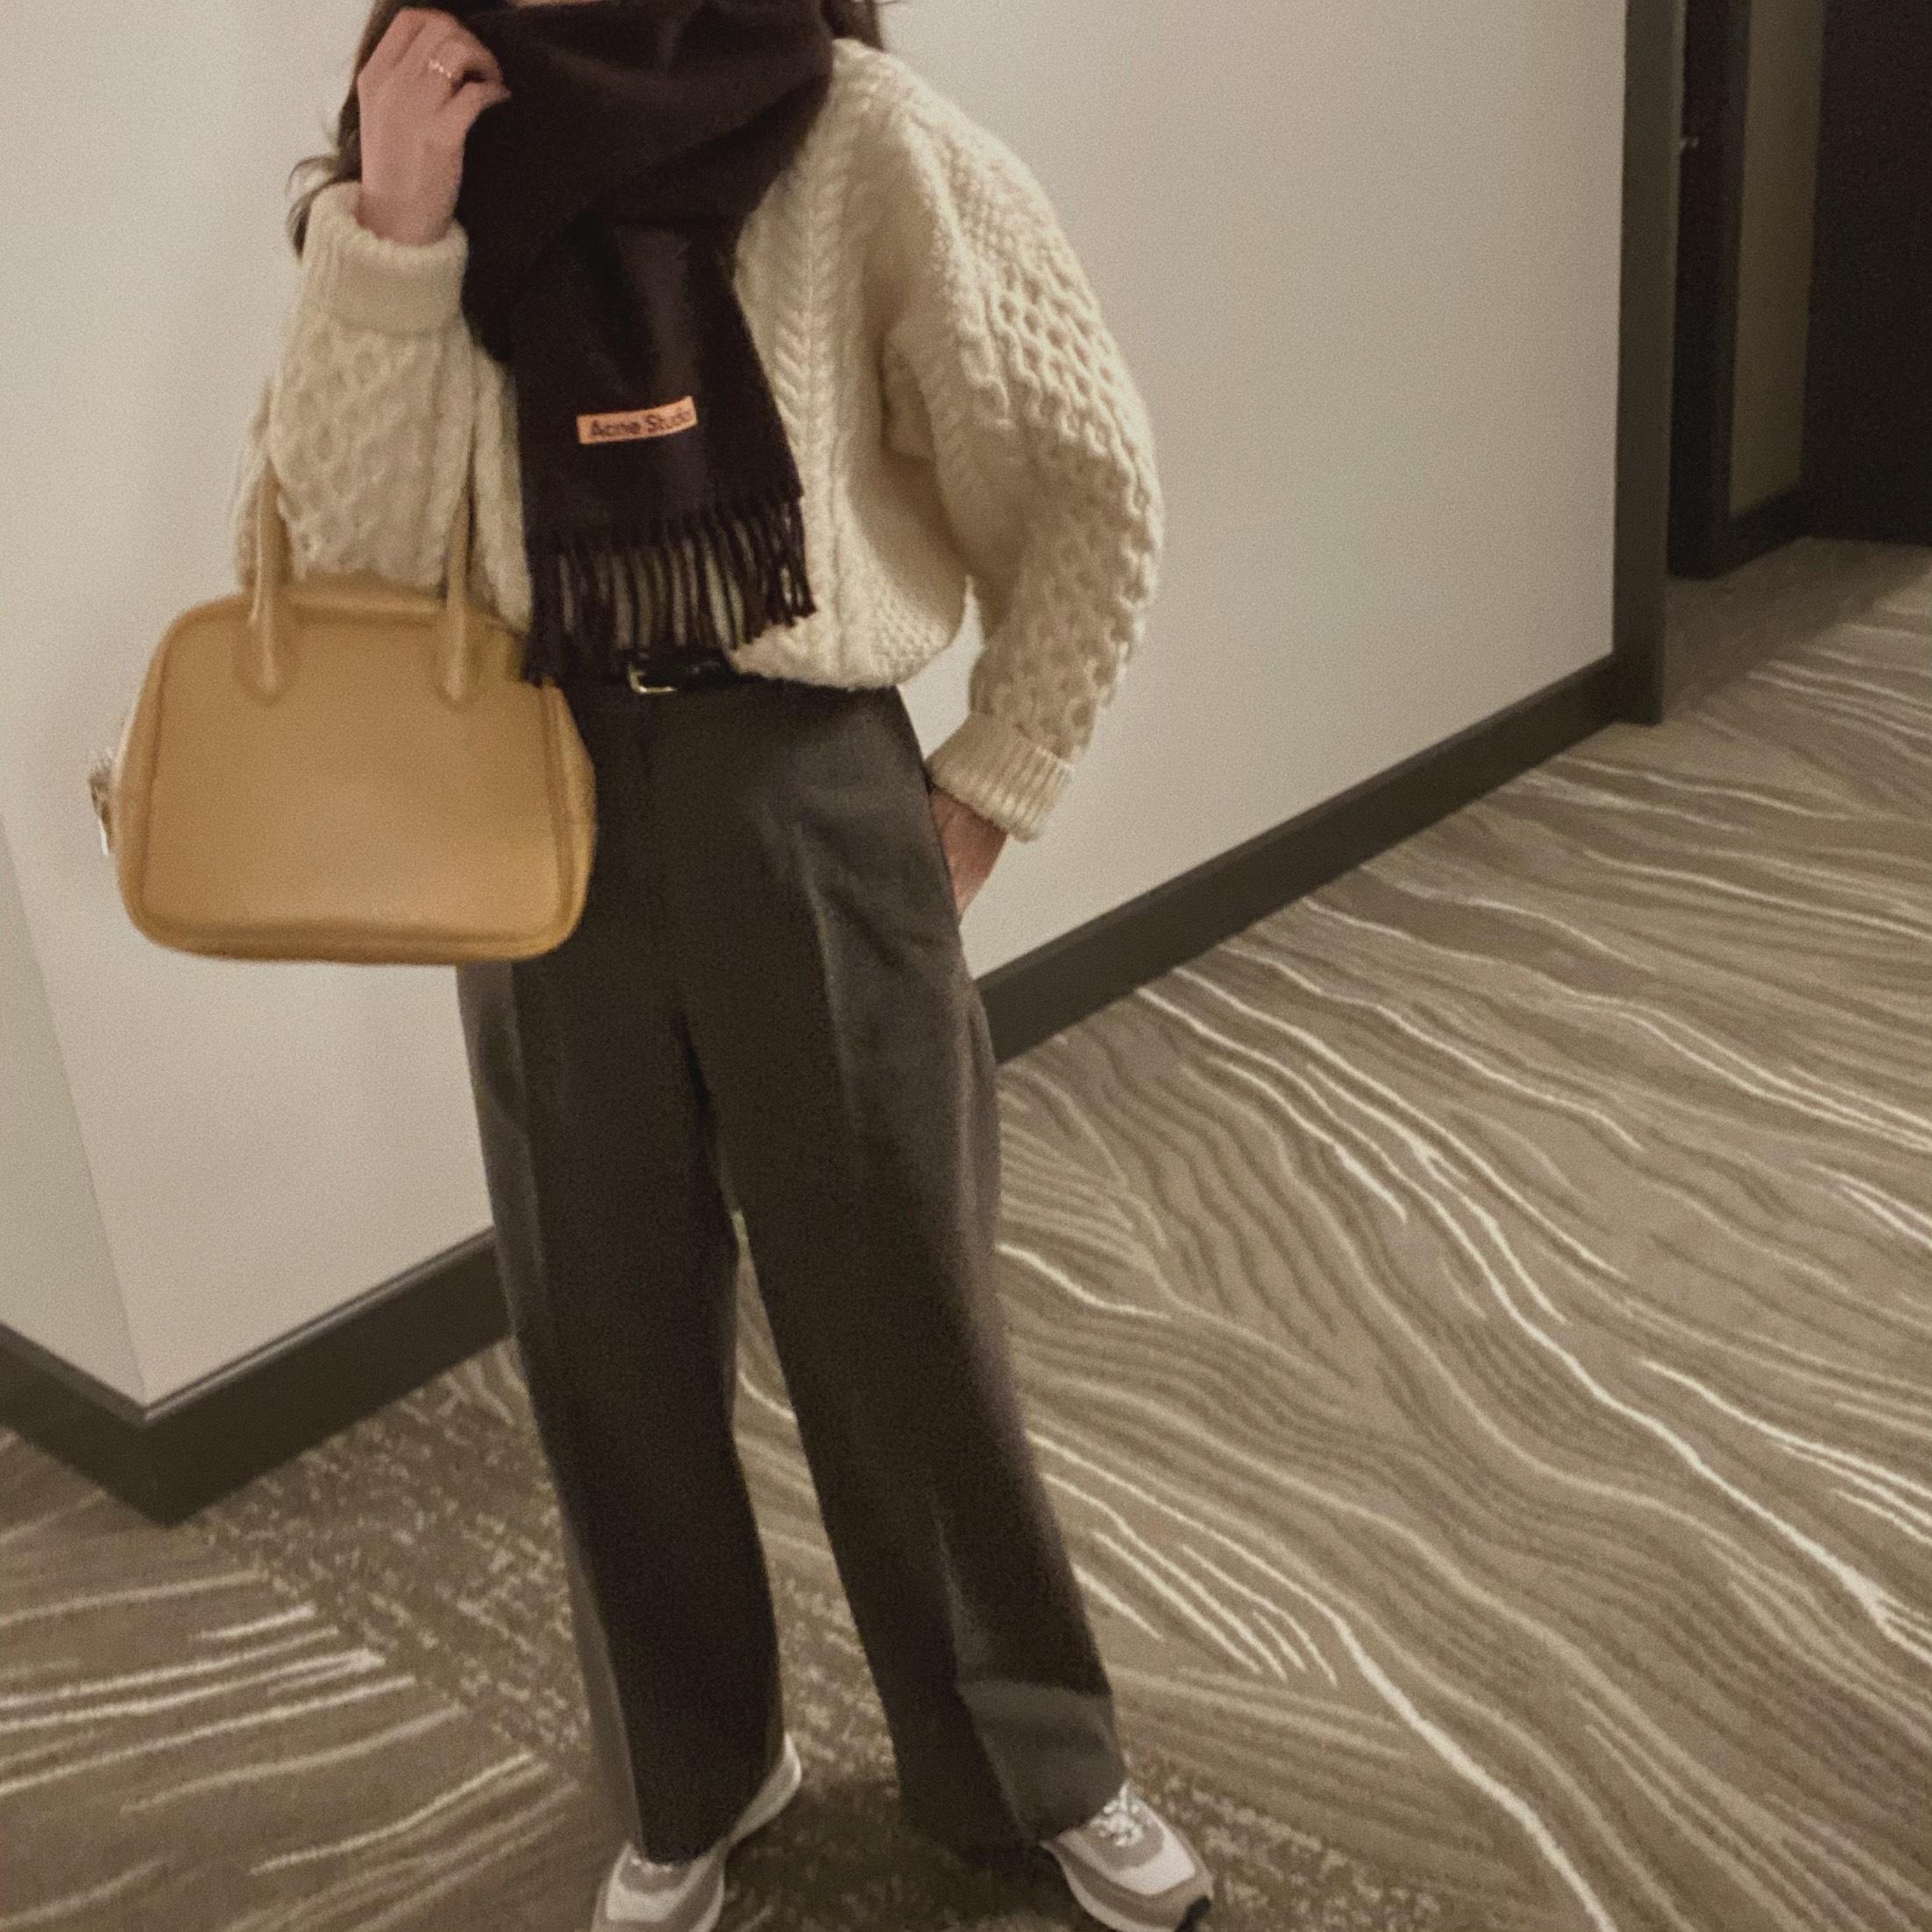 DAYNYC round square hand bag